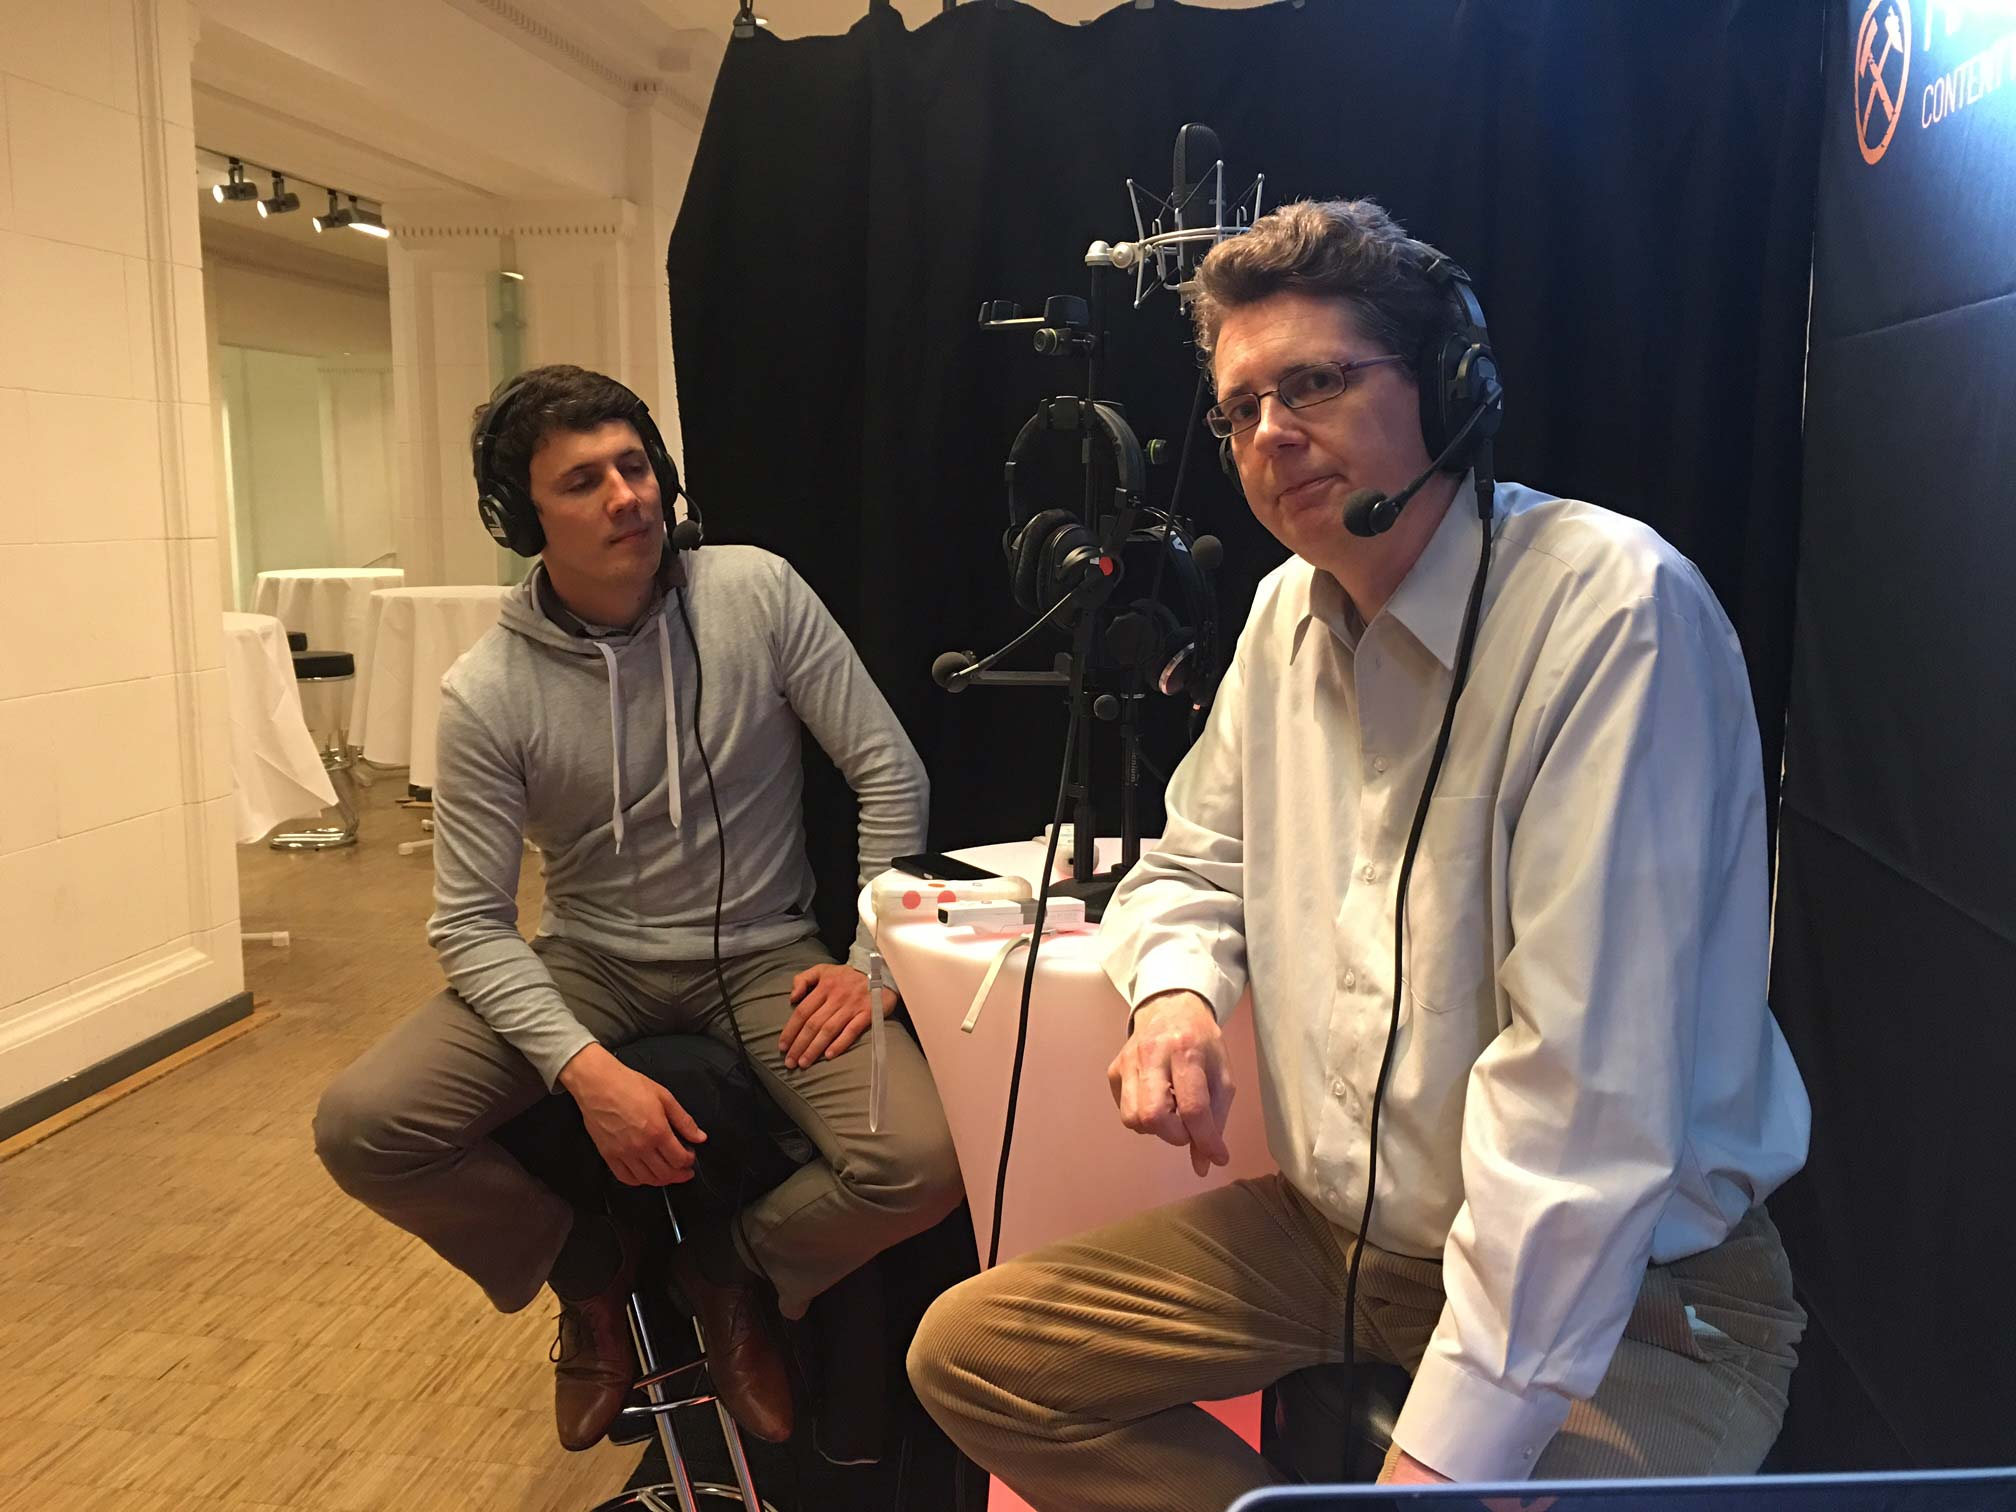 DFK17 Preshow - Jörg Reschke und Andreas Berg